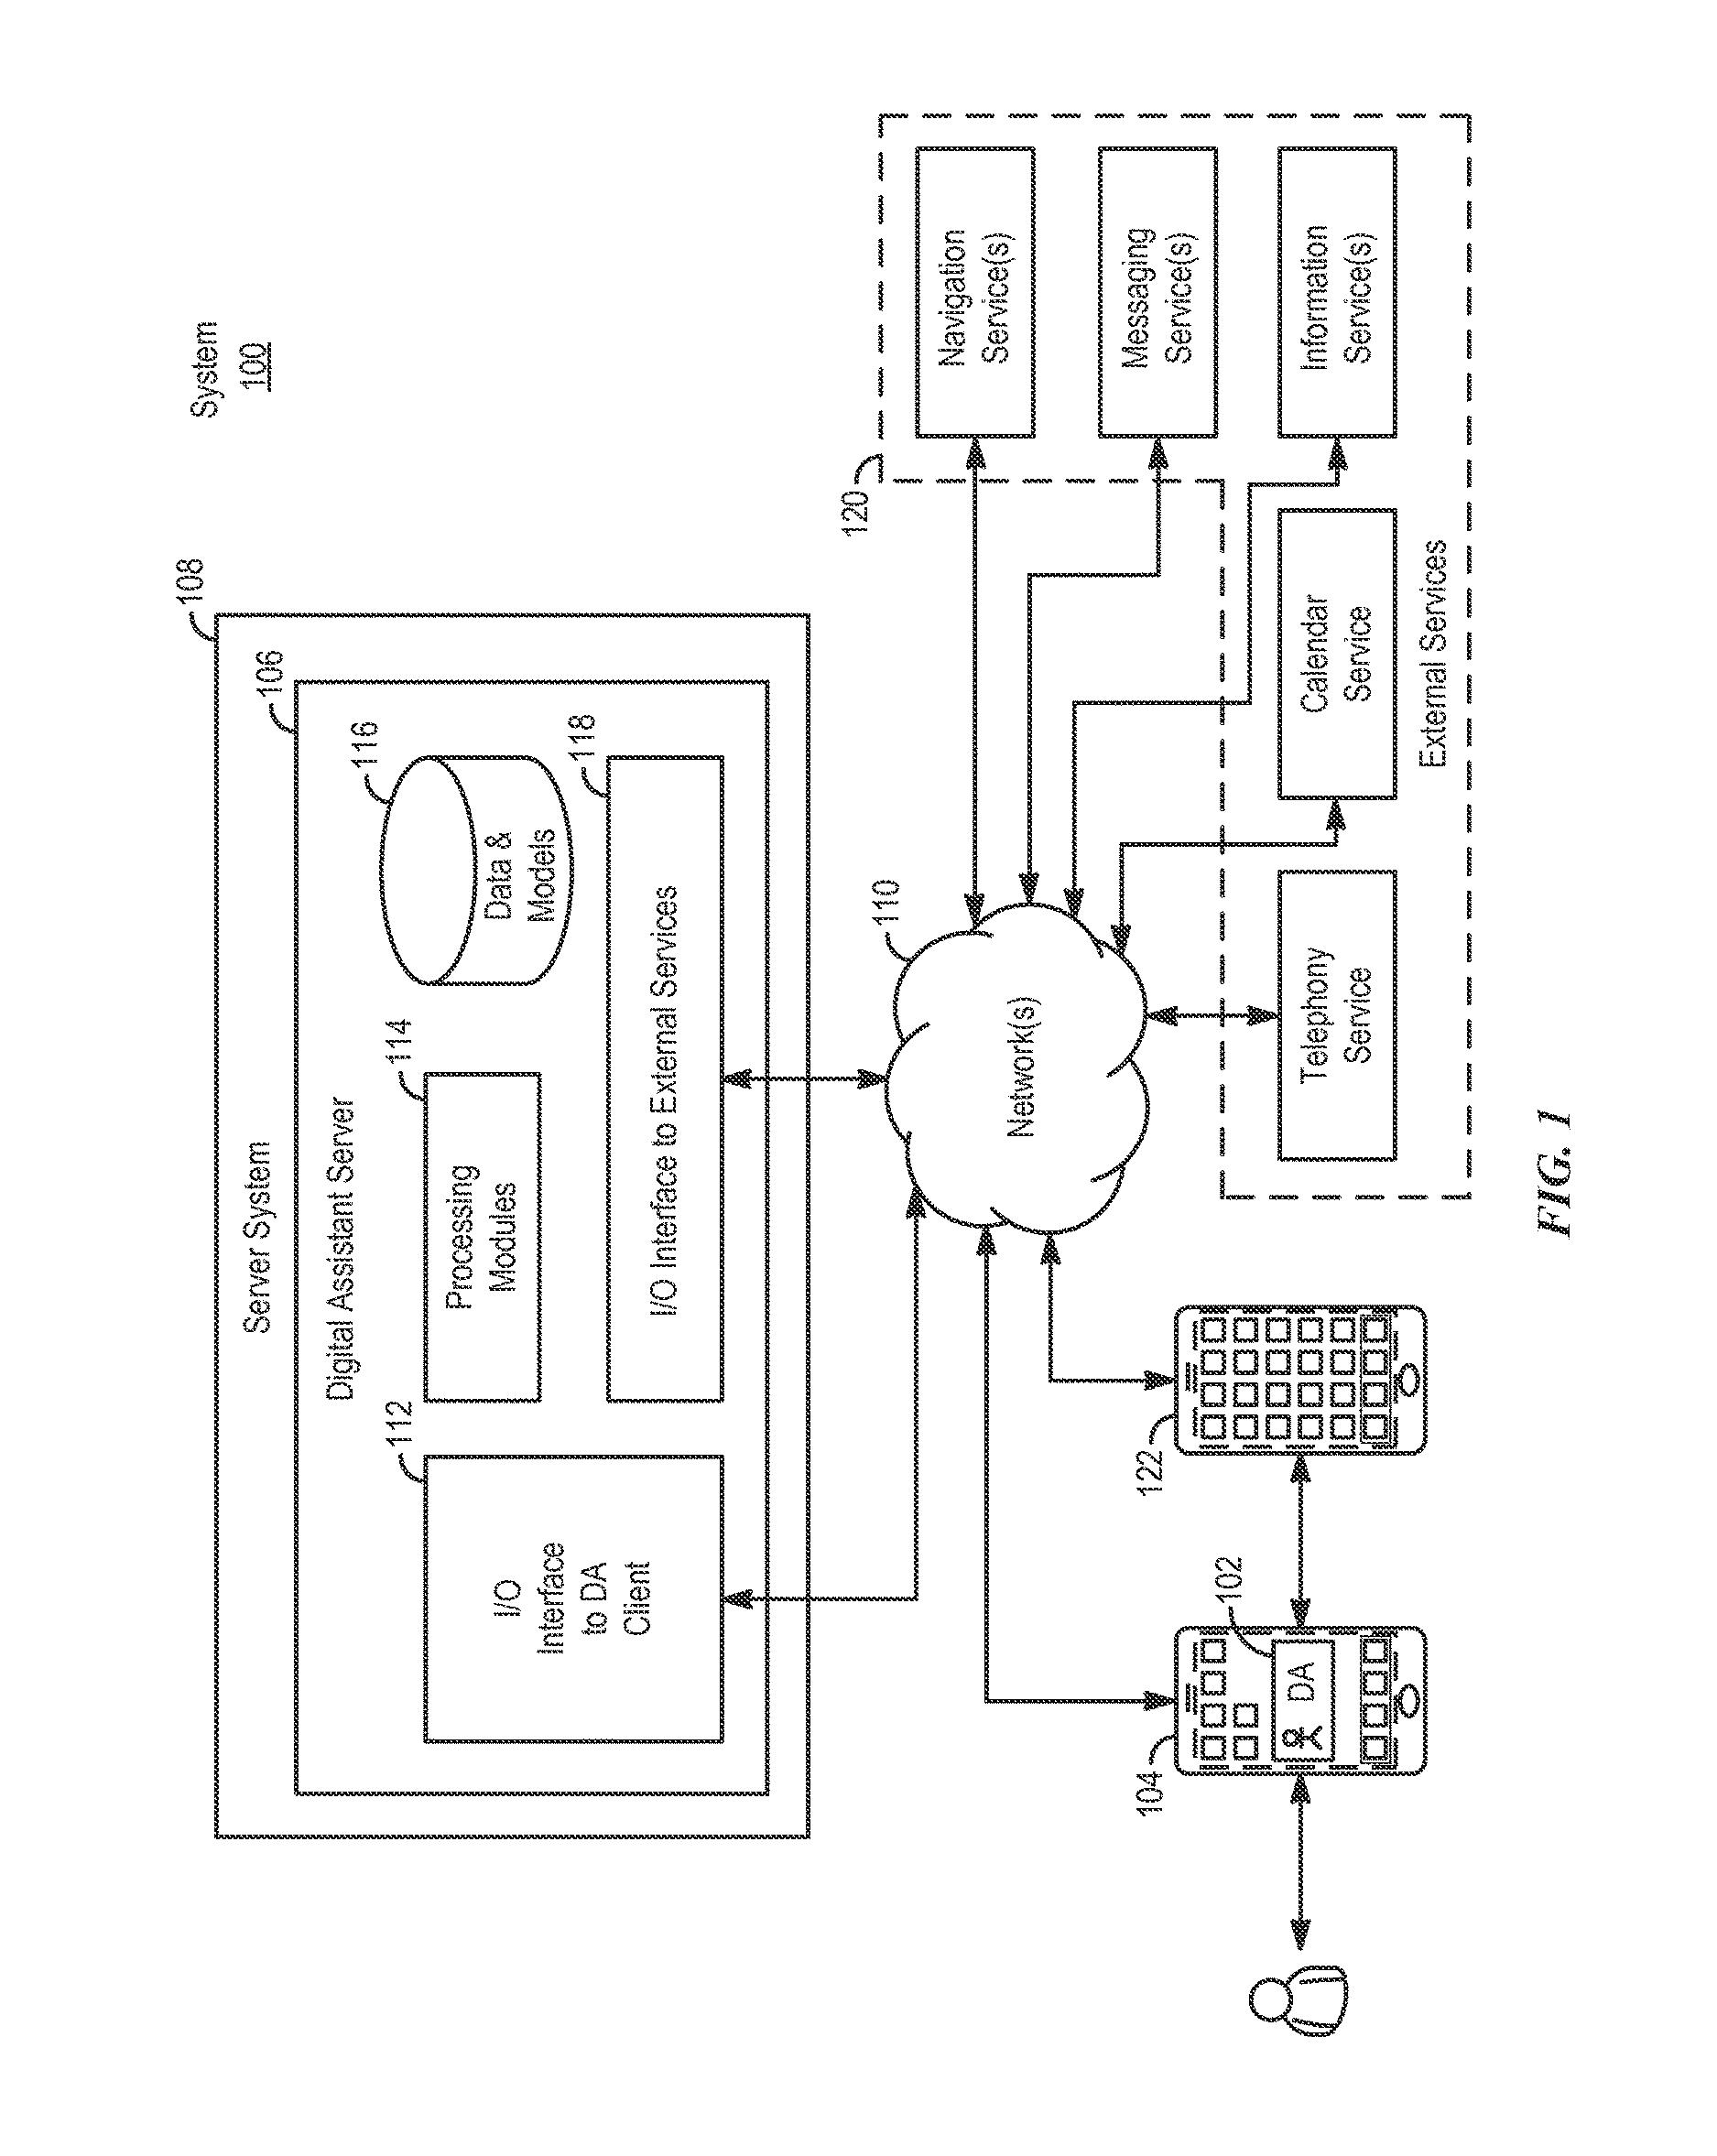 yamaha wiring diagram bose 901 to powered mixer us9886953b2 virtual assistant activation google patents  us9886953b2 virtual assistant